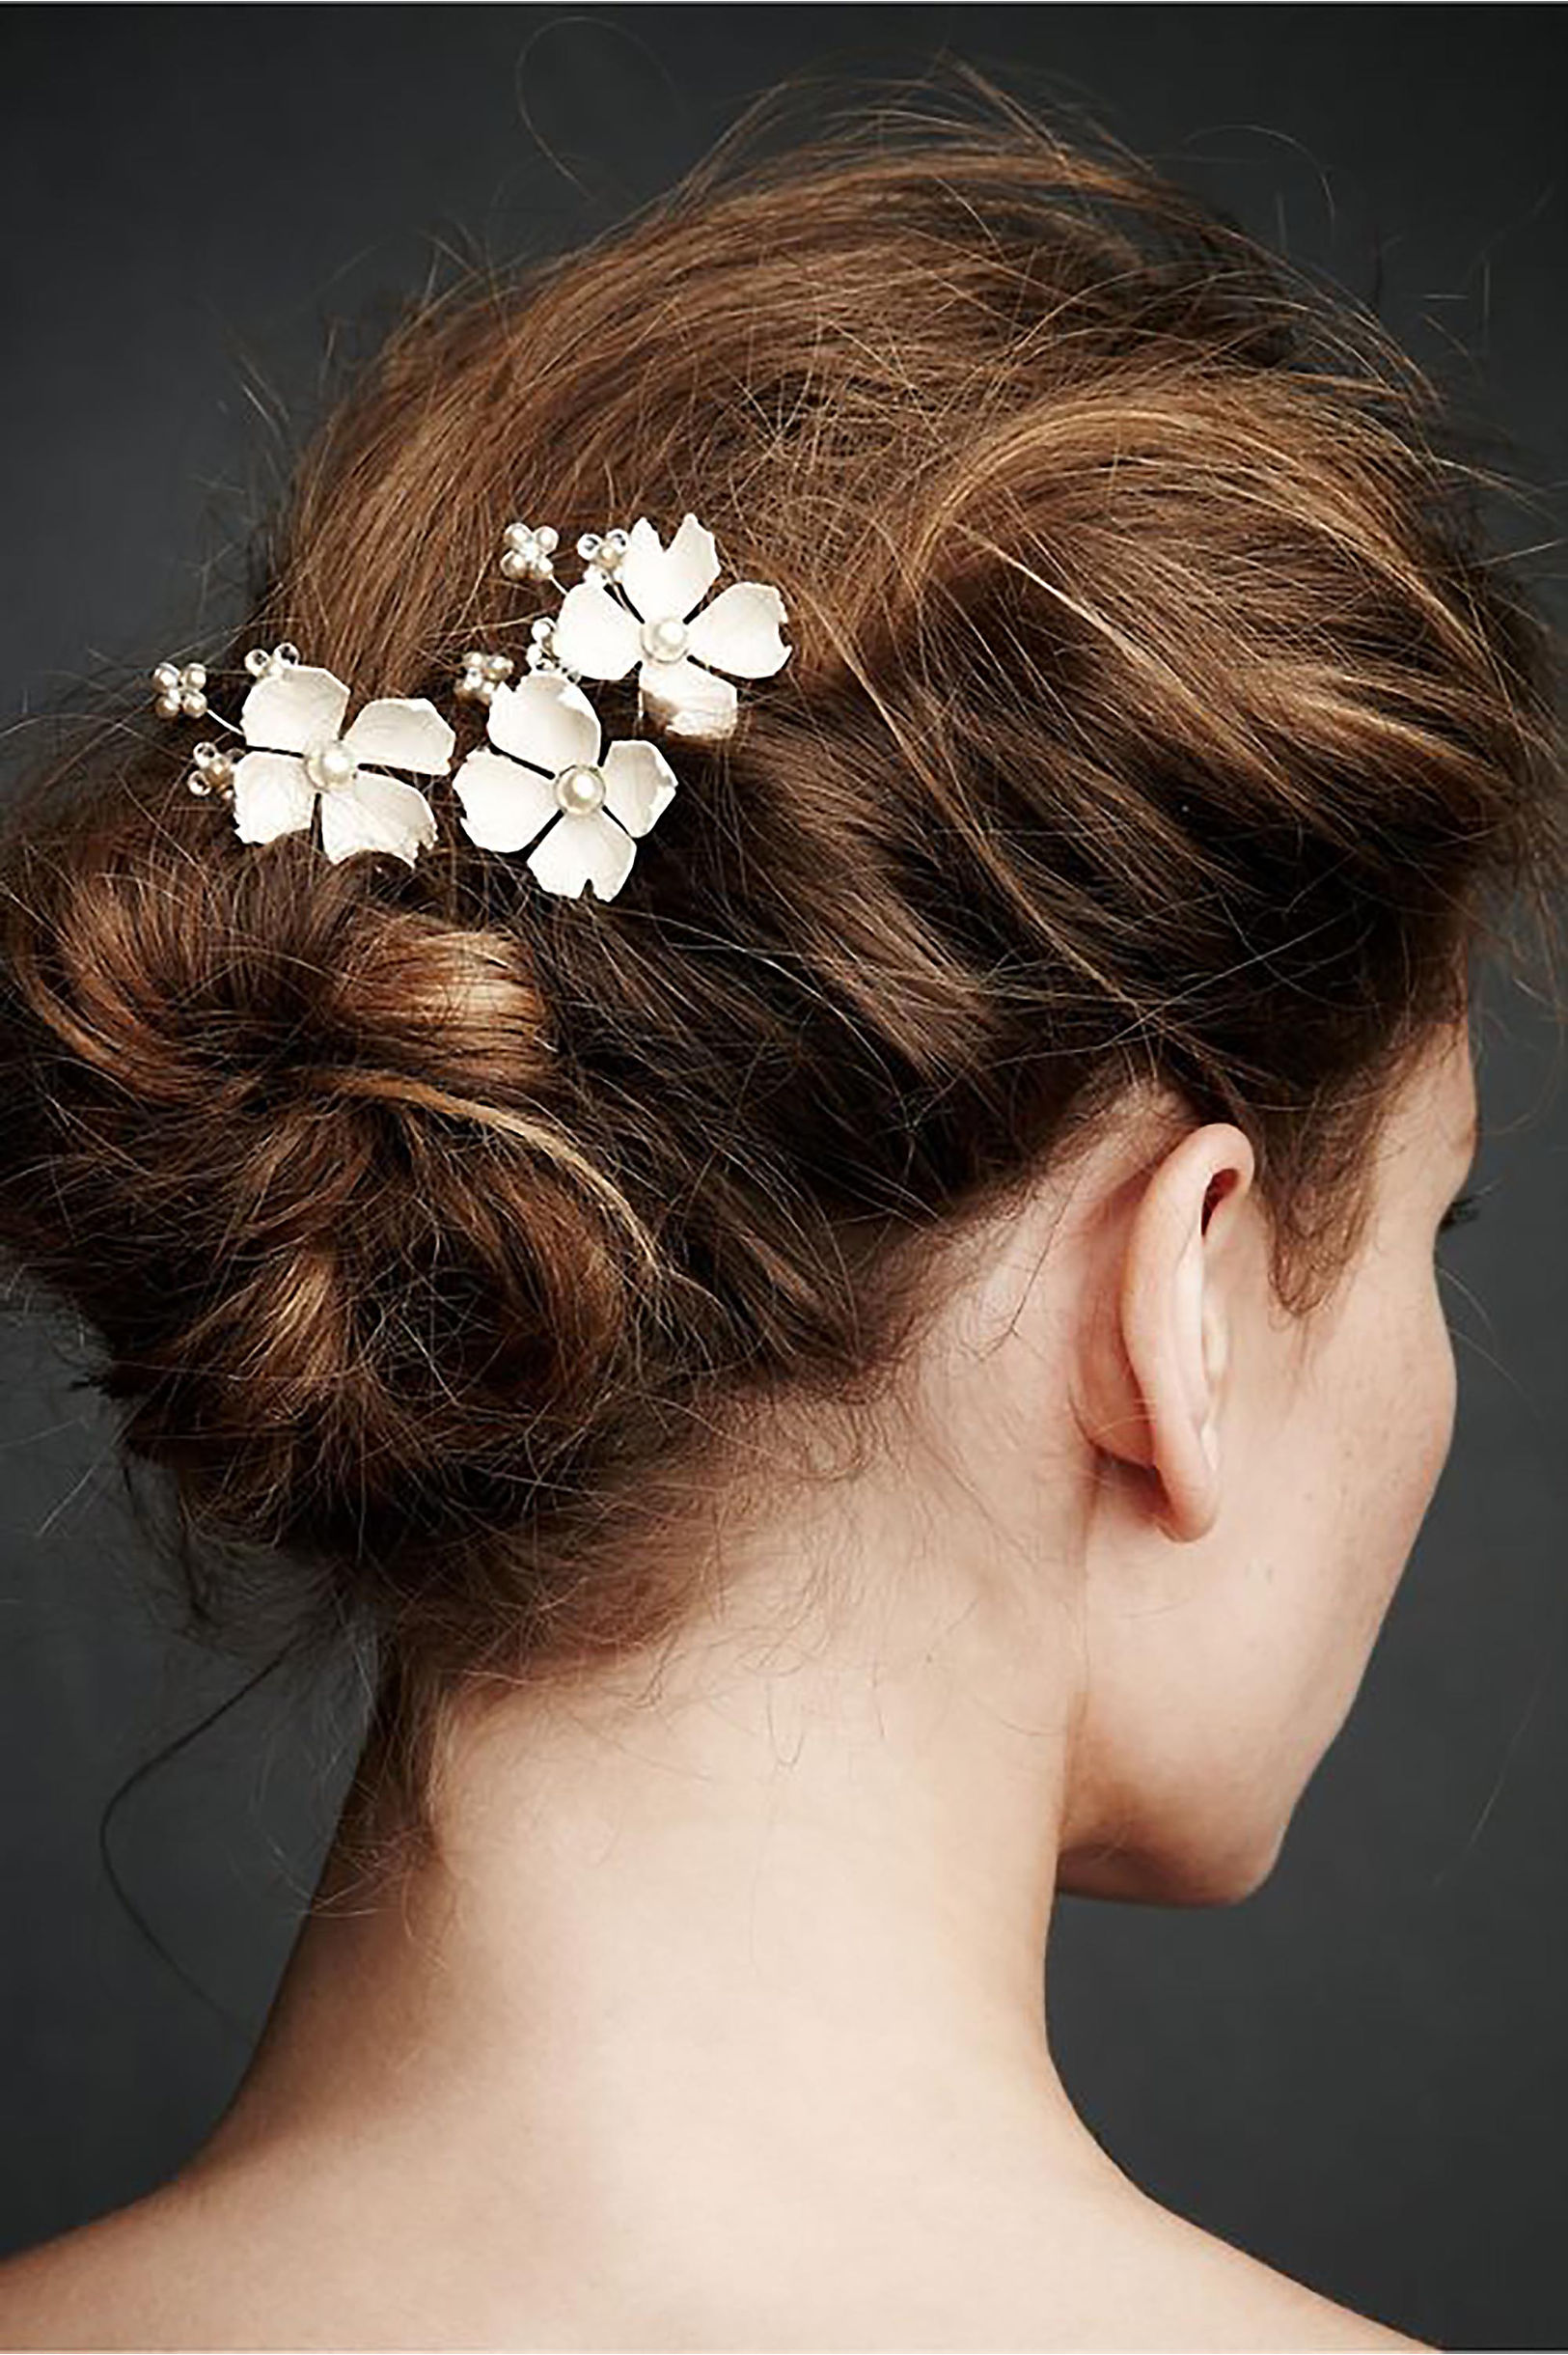 Hair accessories for wedding online india - Dogwood Flower Hairpins 3 In Headpieces Bhldn Aliexpress Com 20pcs Flower Bridal Wedding Hair Pins Accessories